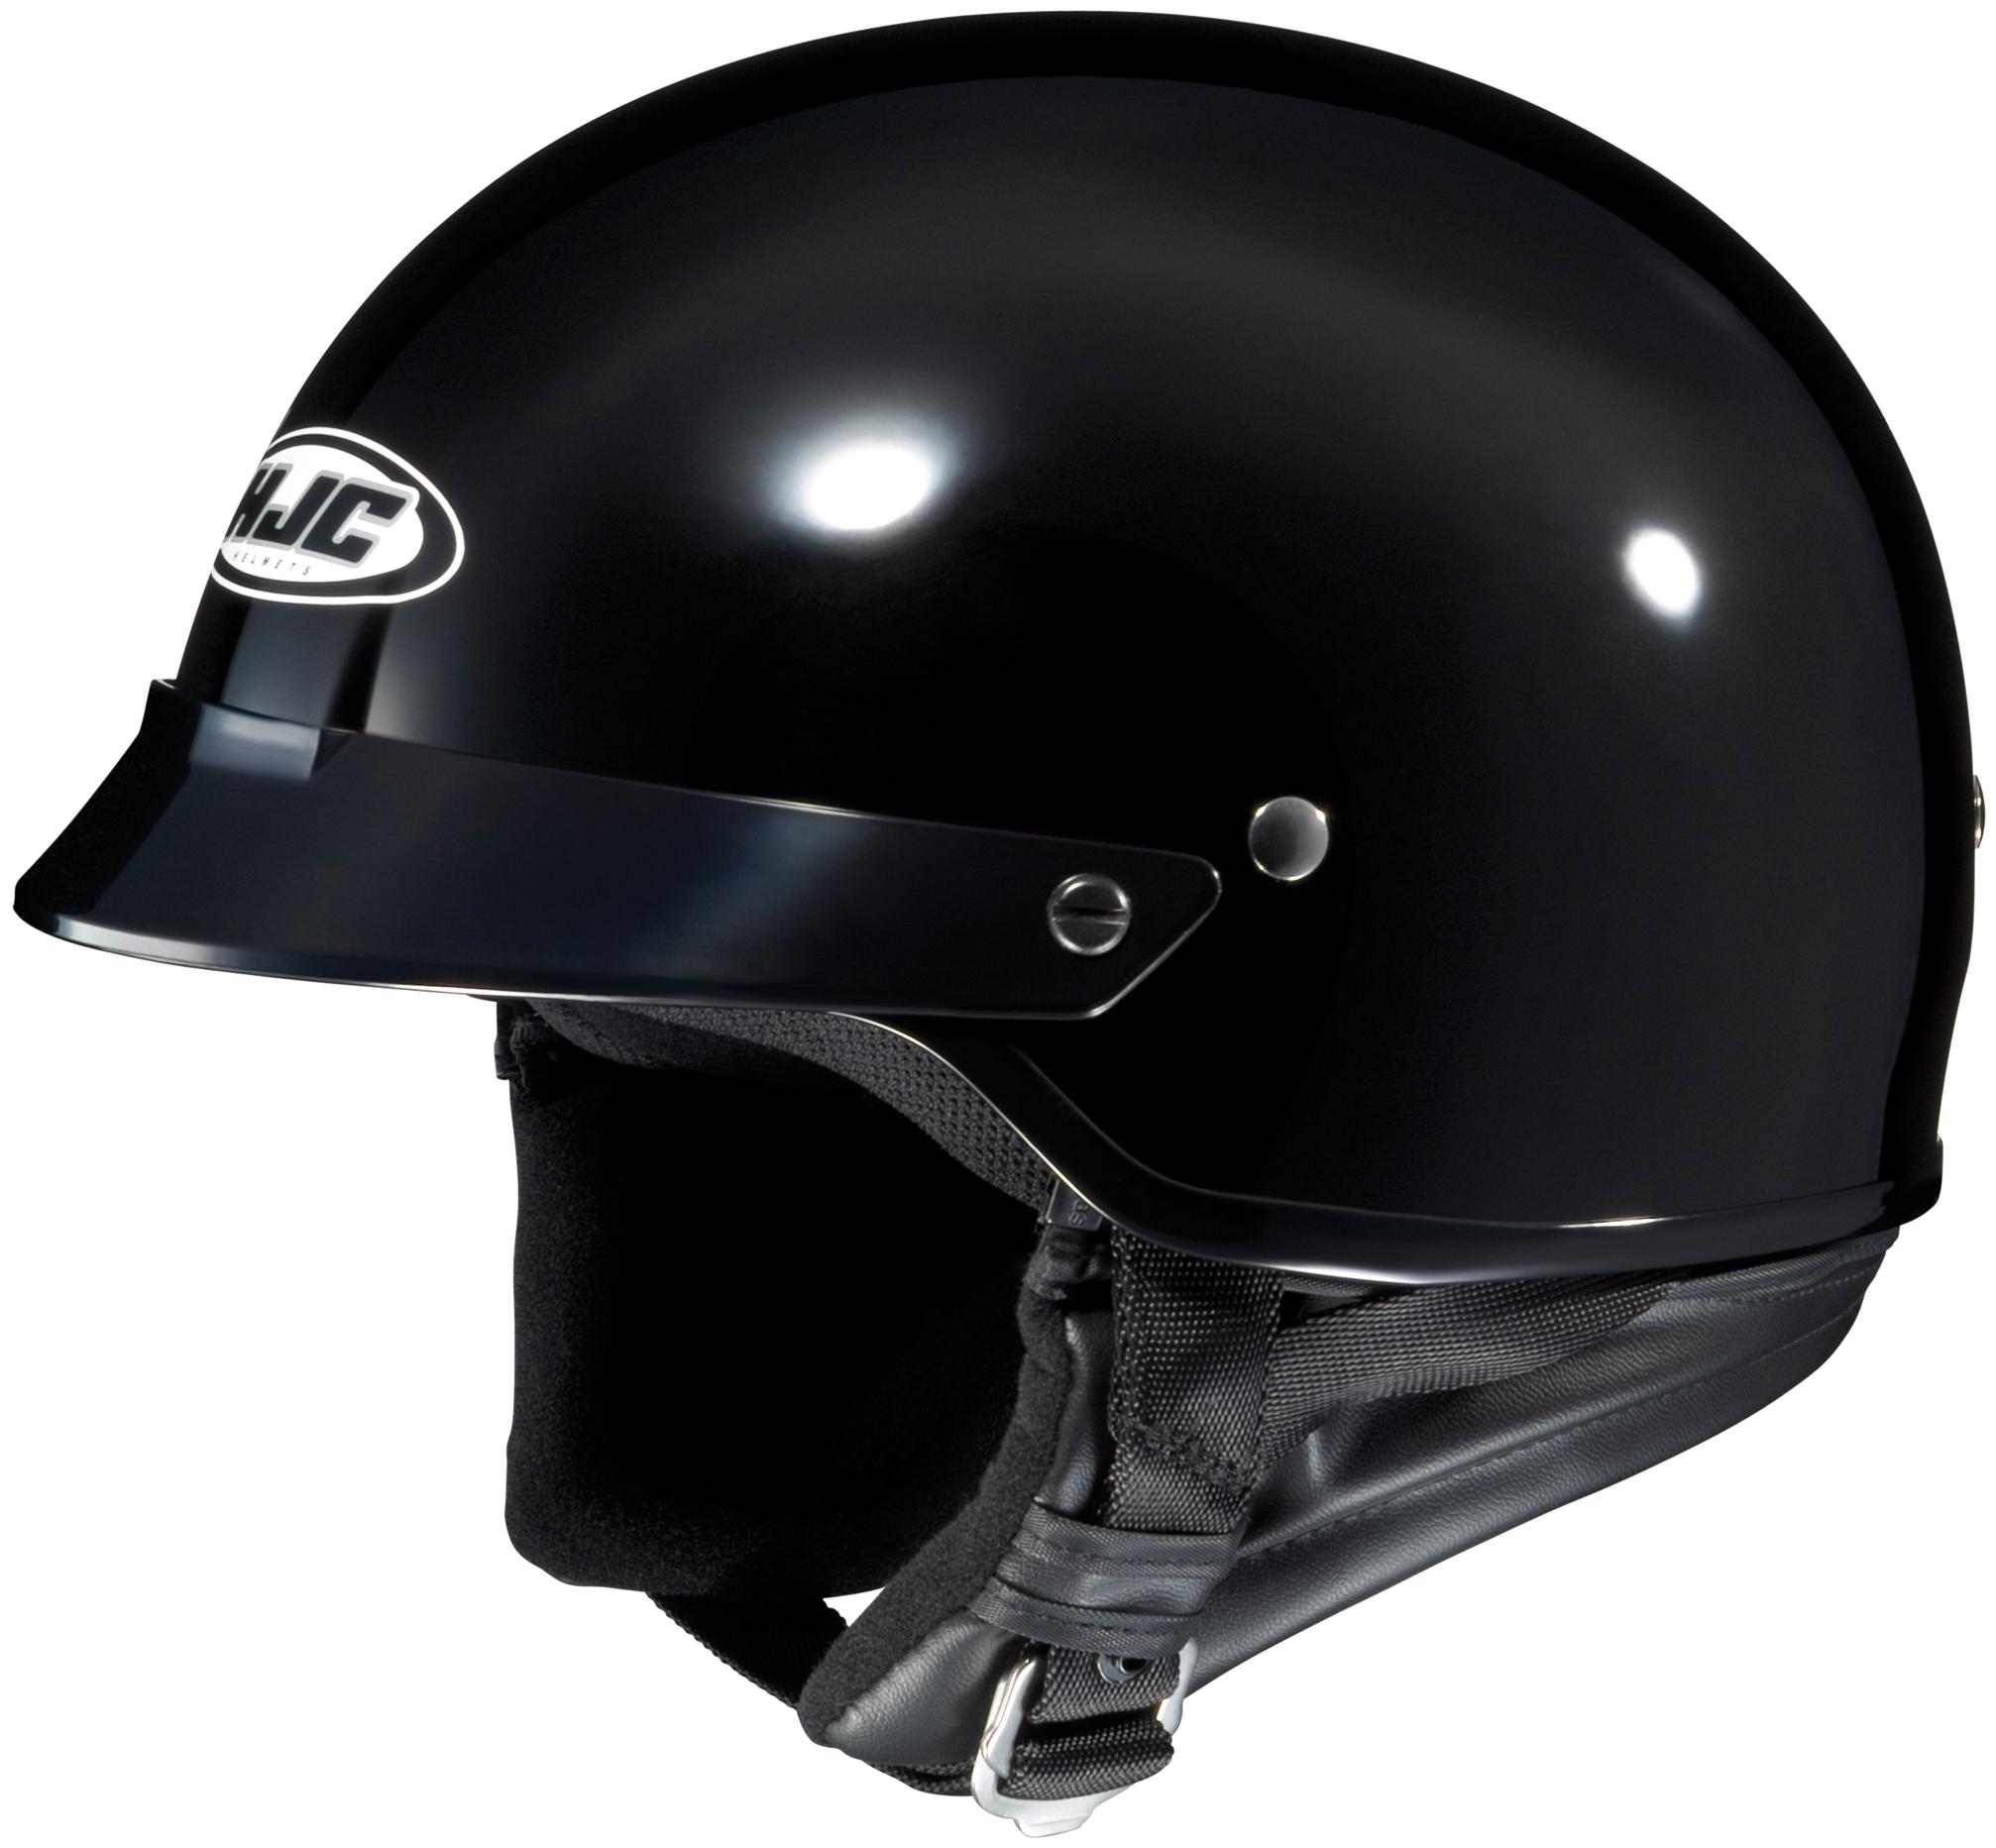 hjc cs 2n motorcycle helmets ebay. Black Bedroom Furniture Sets. Home Design Ideas